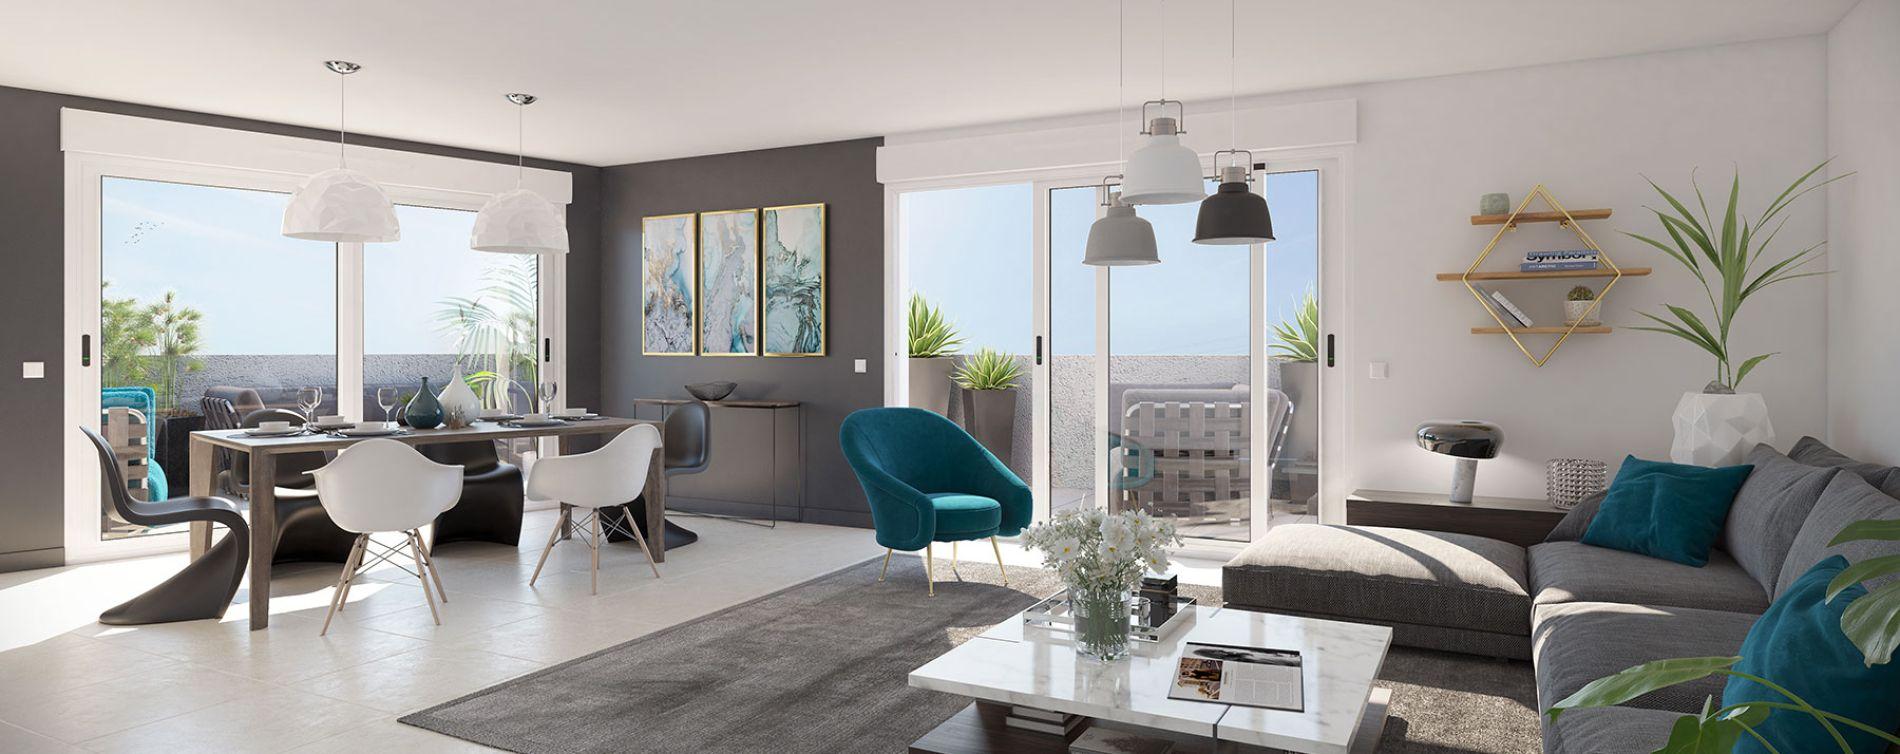 Roquebrune-Cap-Martin : programme immobilier neuve « Kosmic » en Loi Pinel